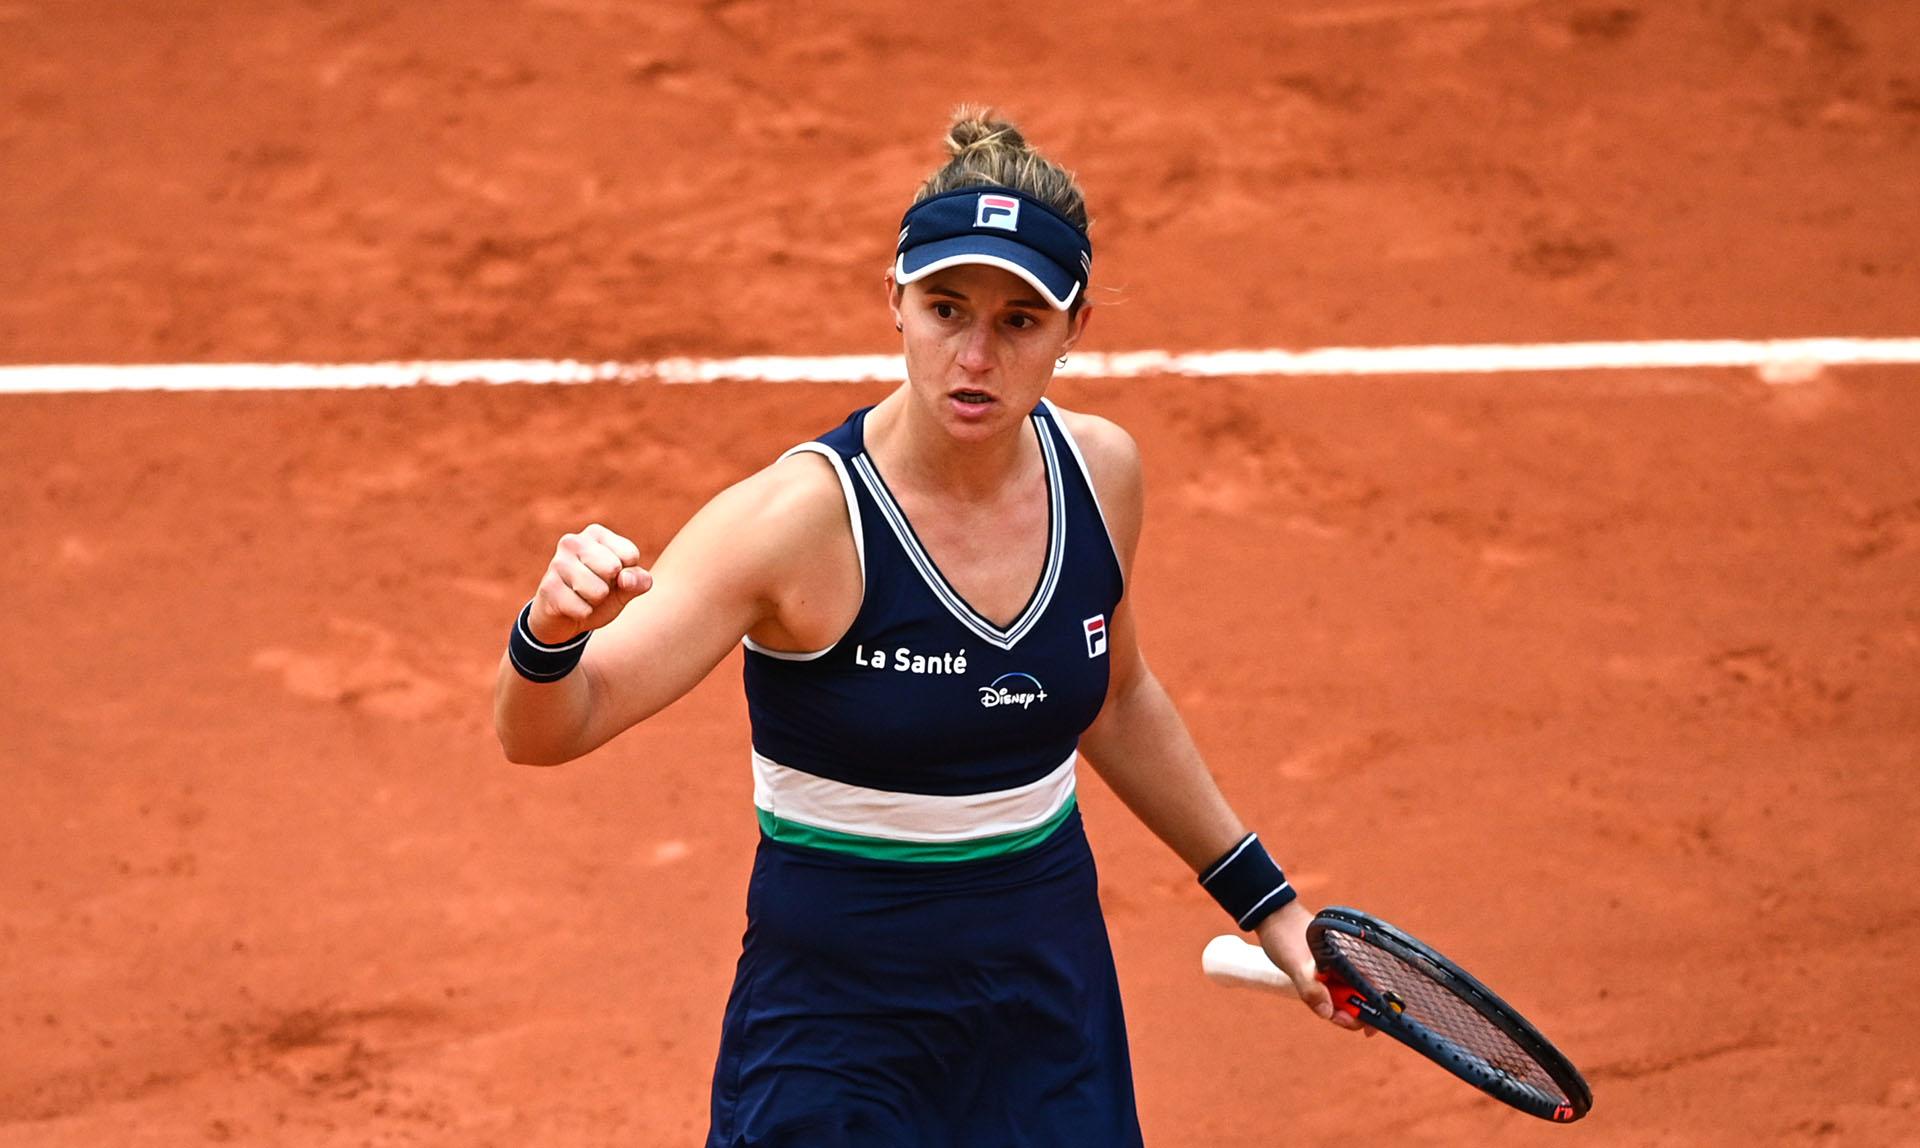 Podoroska se clasificó a las semifinales del Abierto de Francia (Photo by Anne-Christine POUJOULAT / AFP)